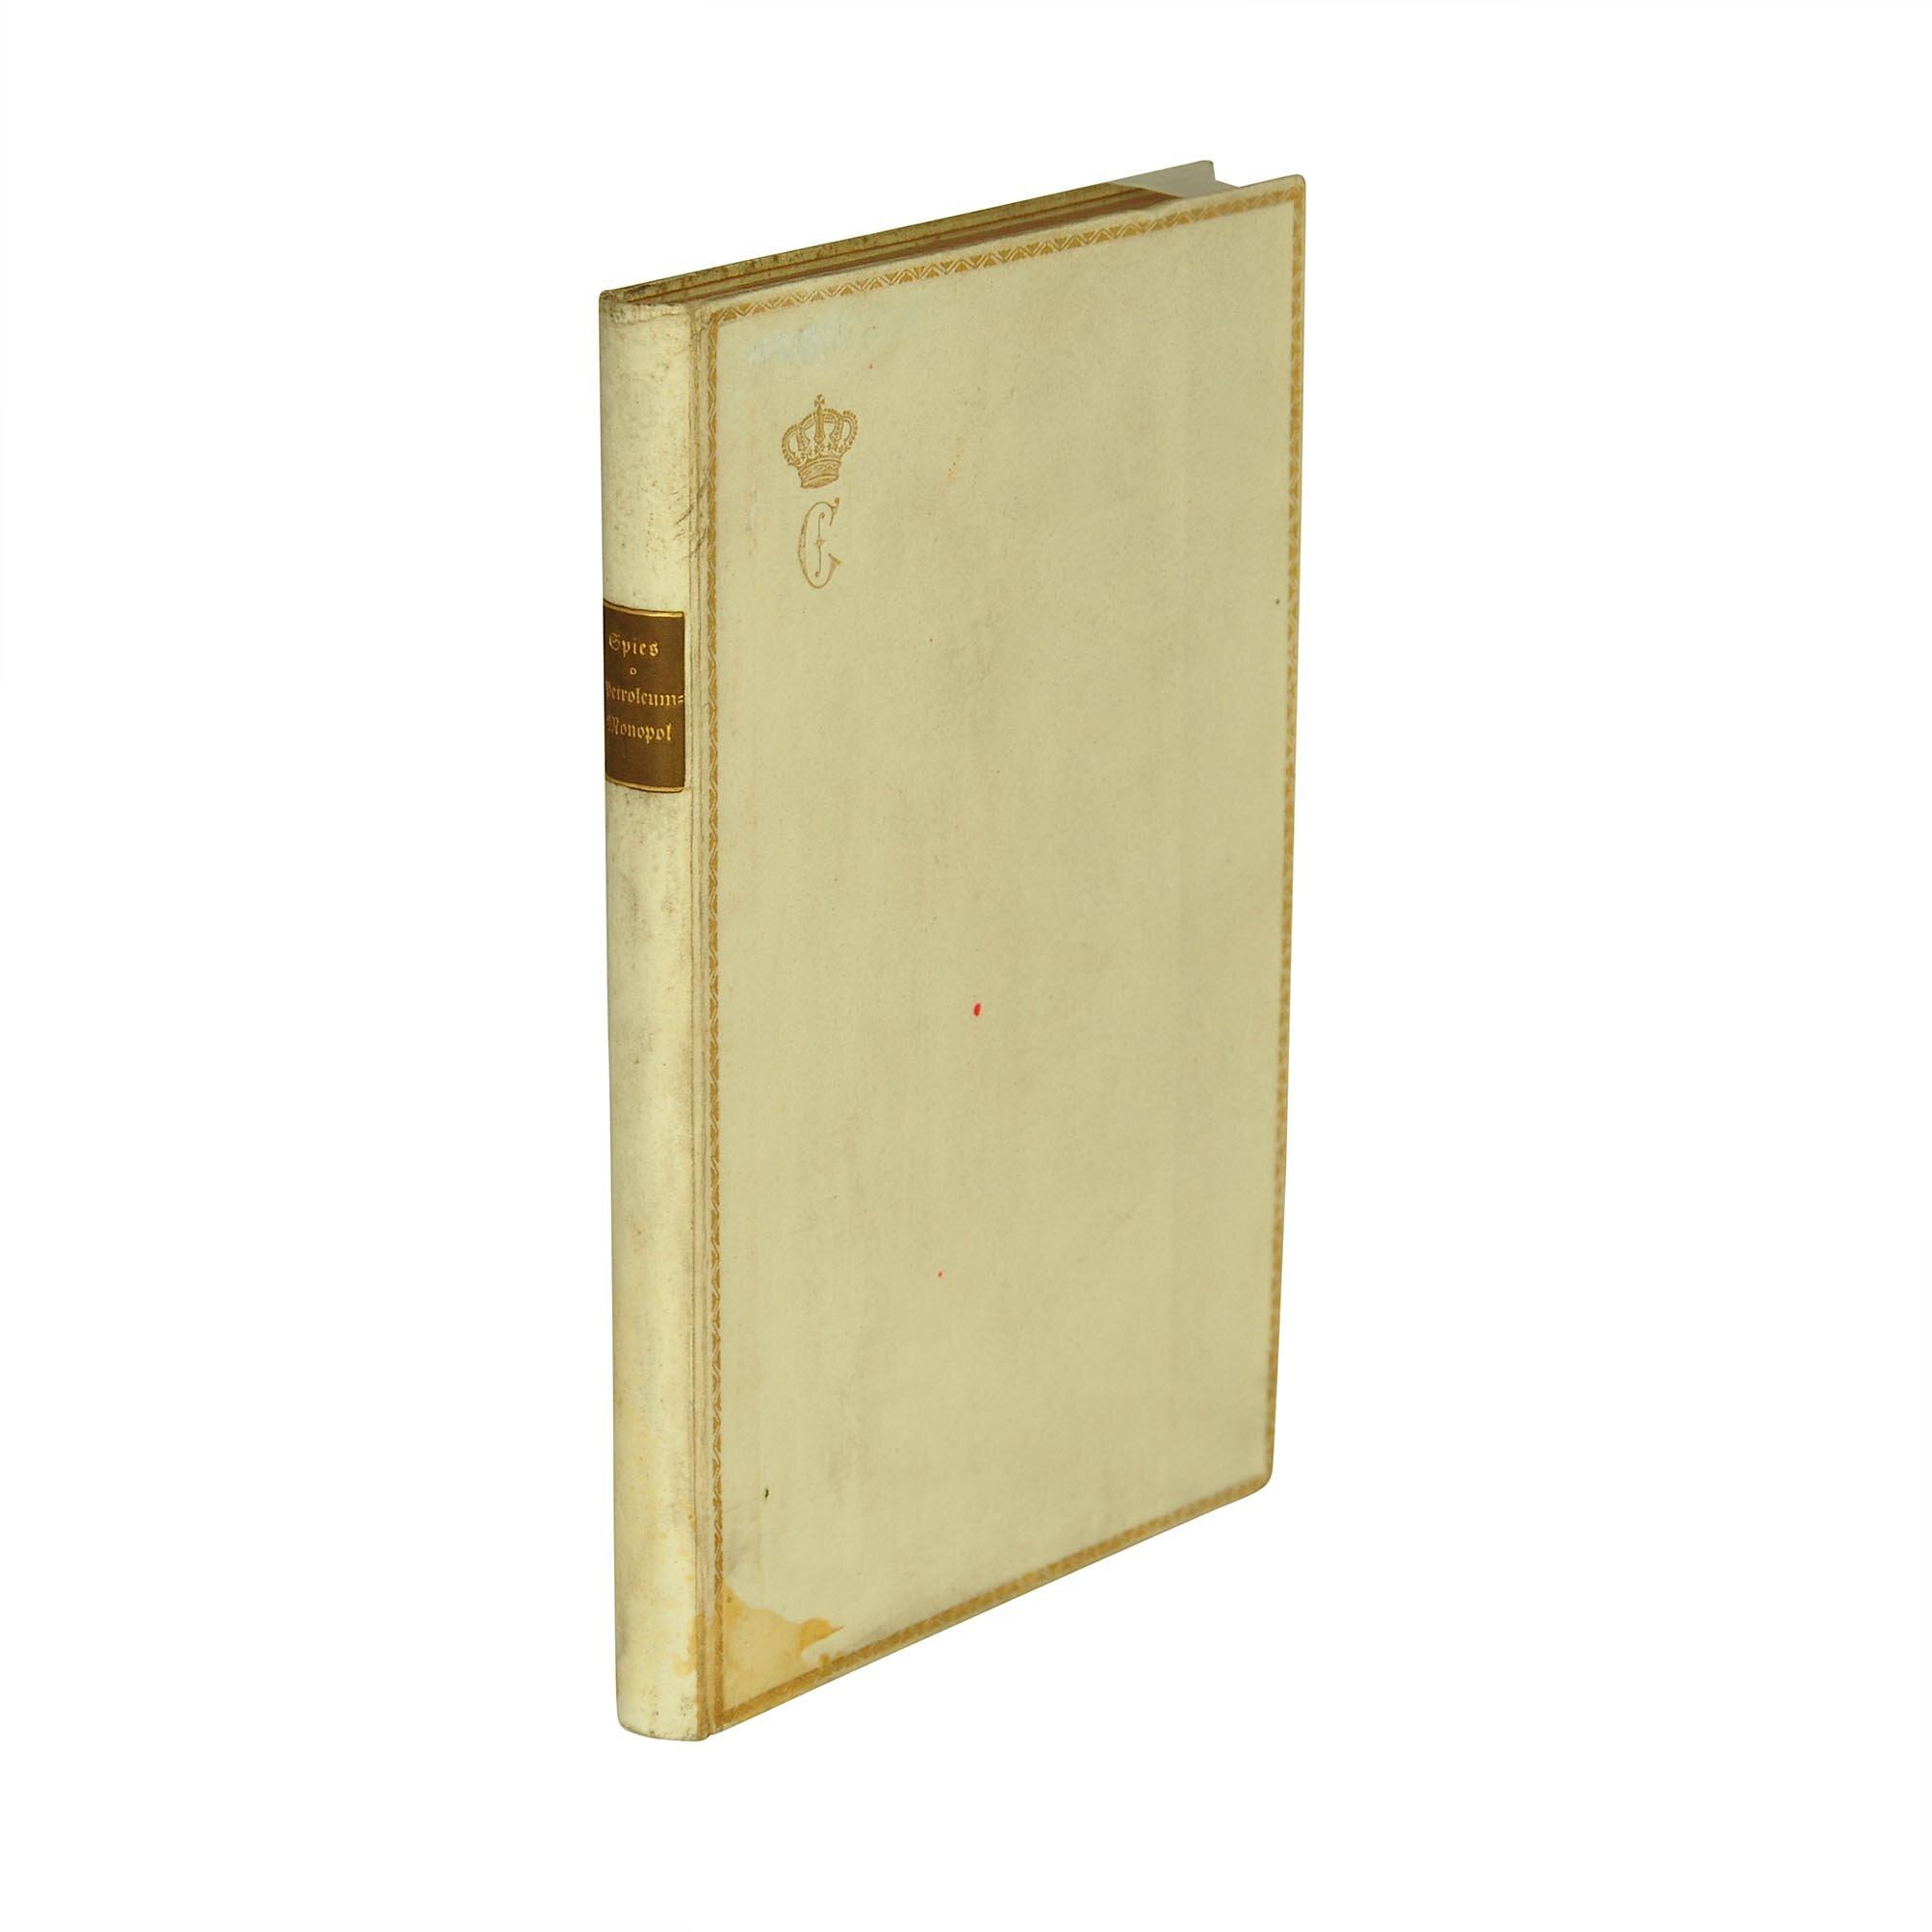 5518 Spies Petrolium Einband Carol 1913 frei 1 A N